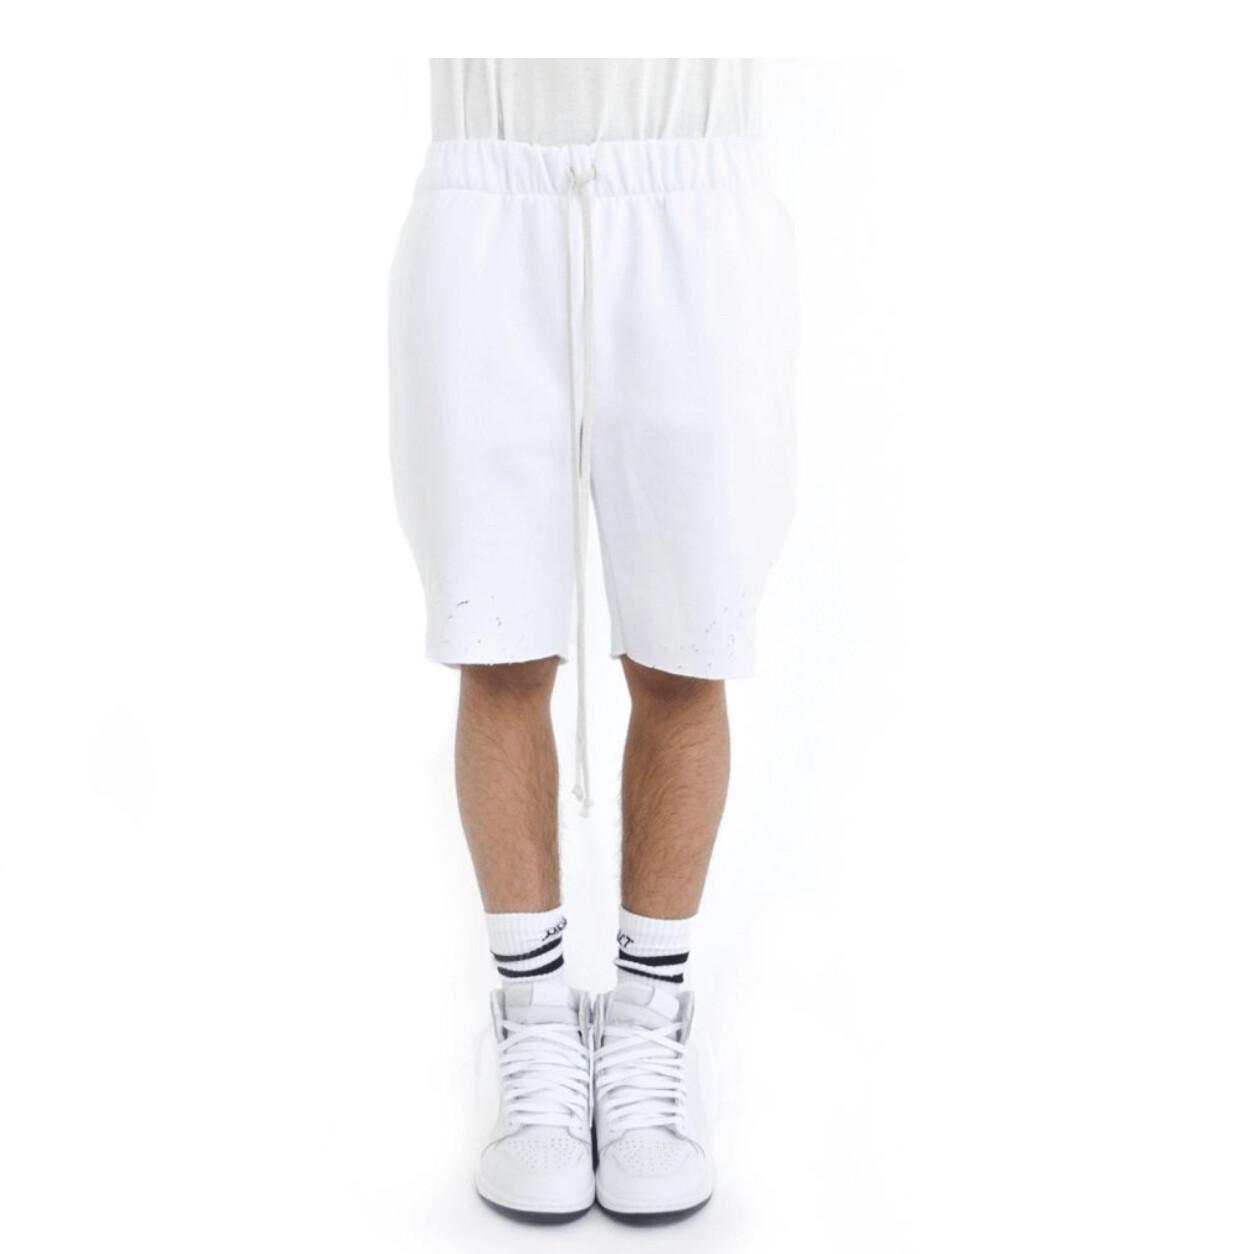 EPTM Distressed Fleece Shorts